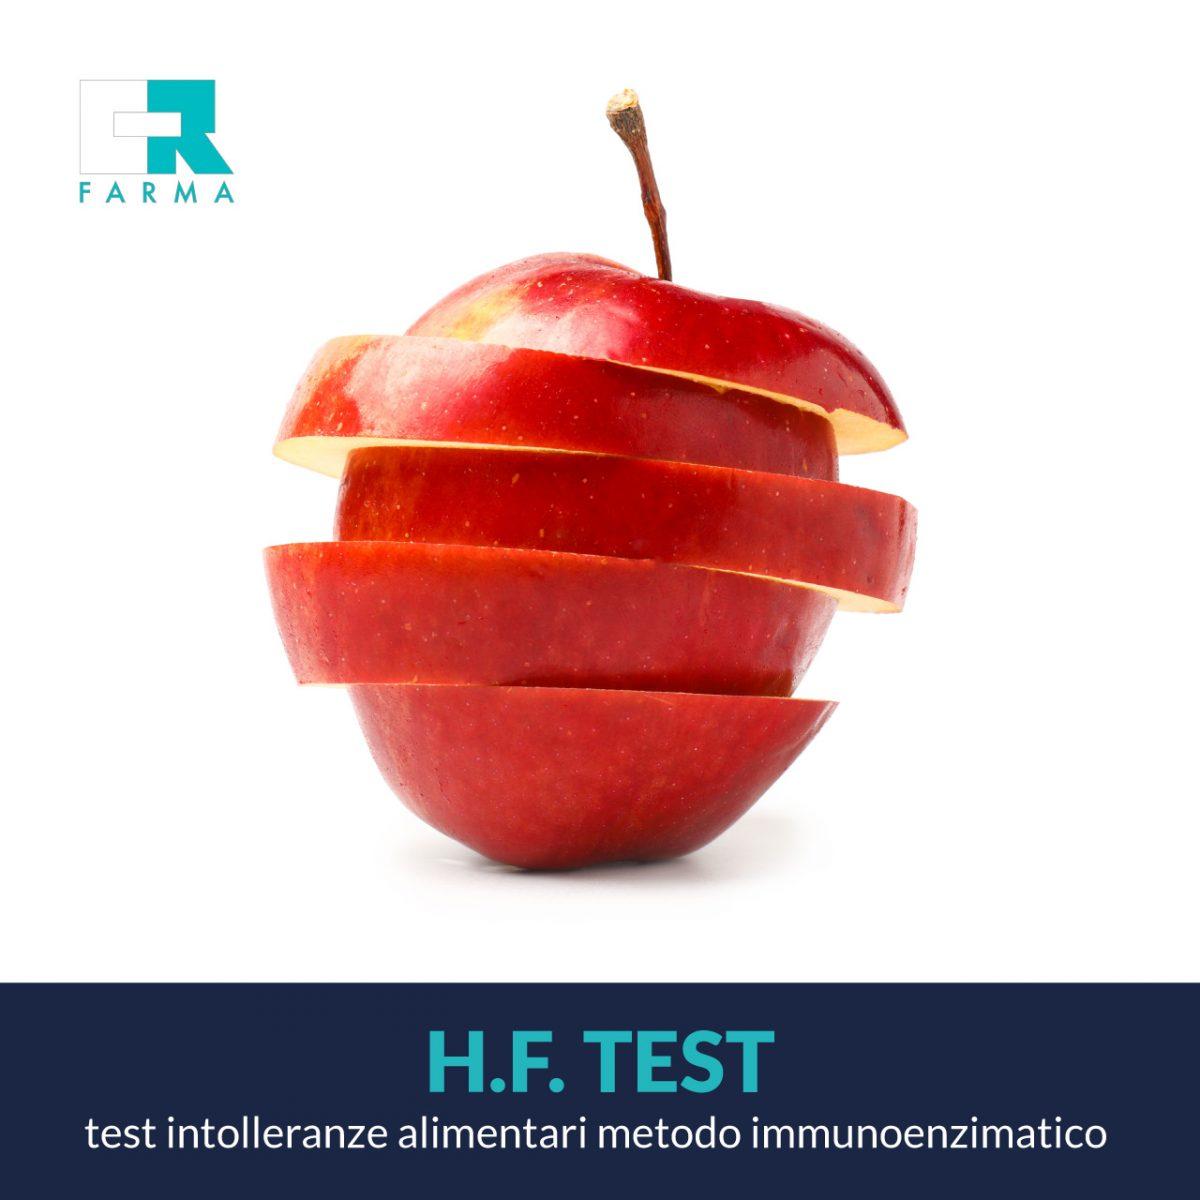 H.F. test - Analisi intolleranze alimentari